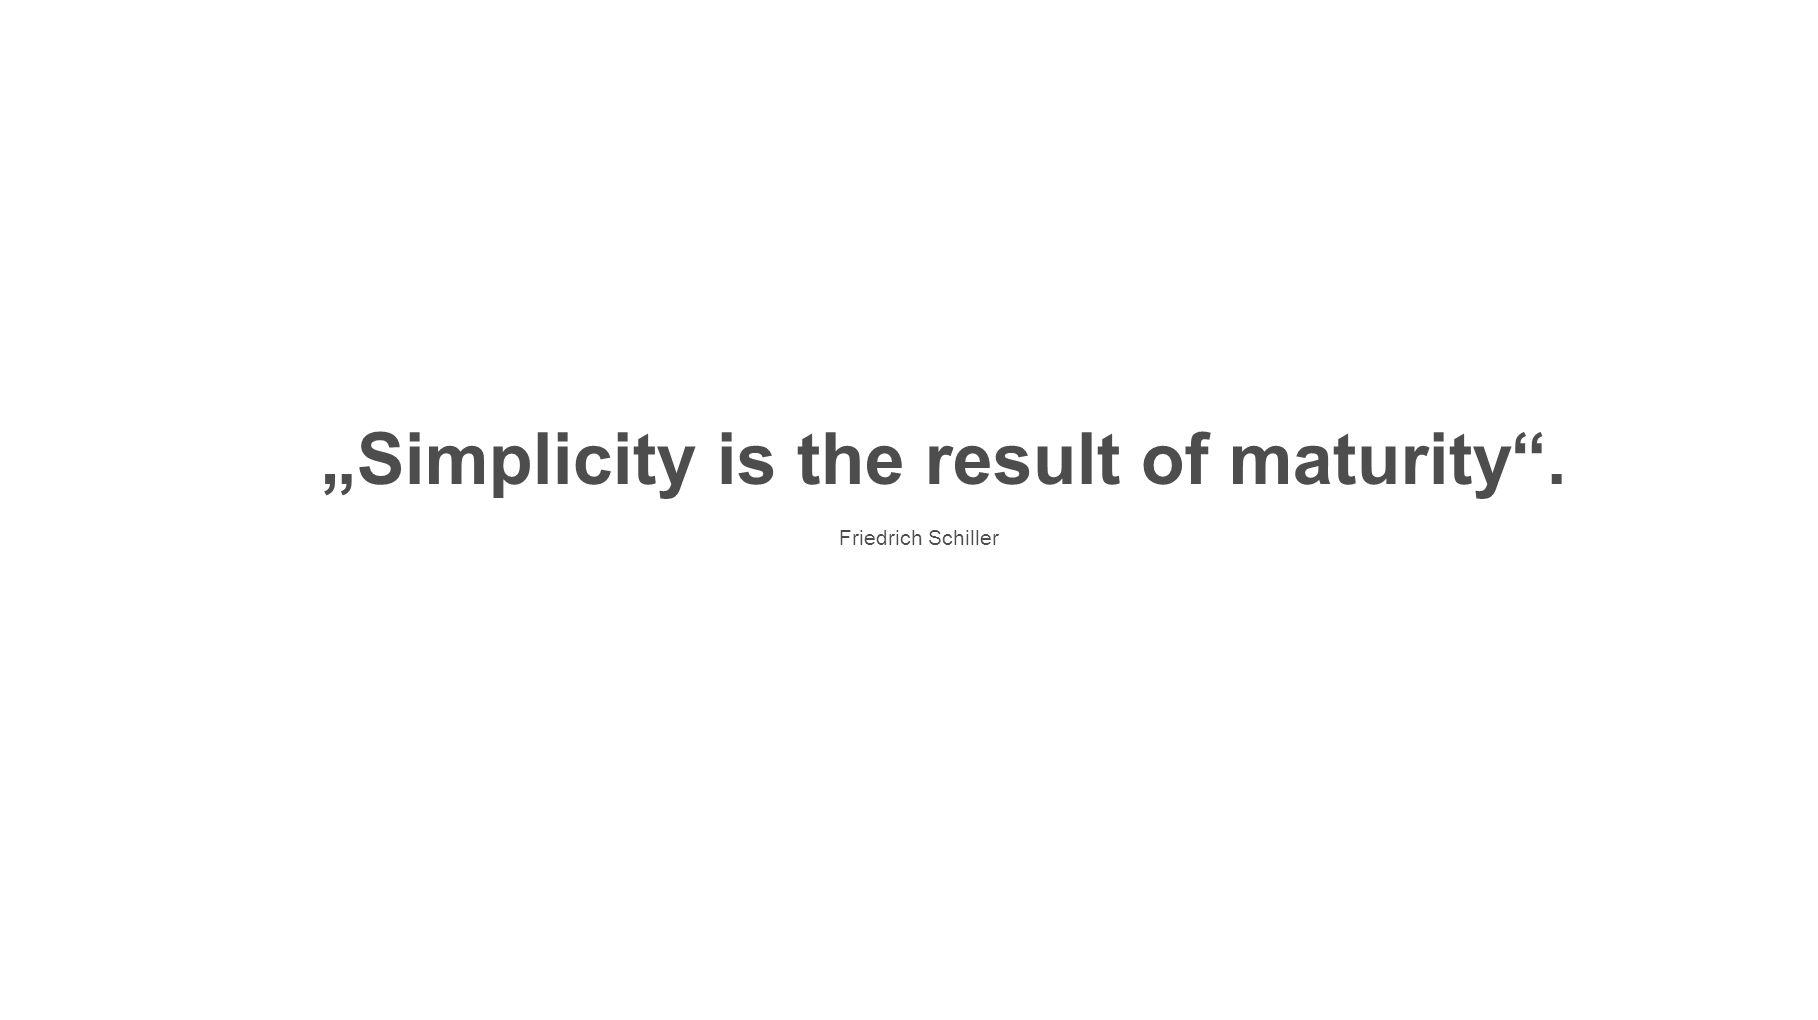 """Simplicity is the result of maturity . Friedrich Schiller"